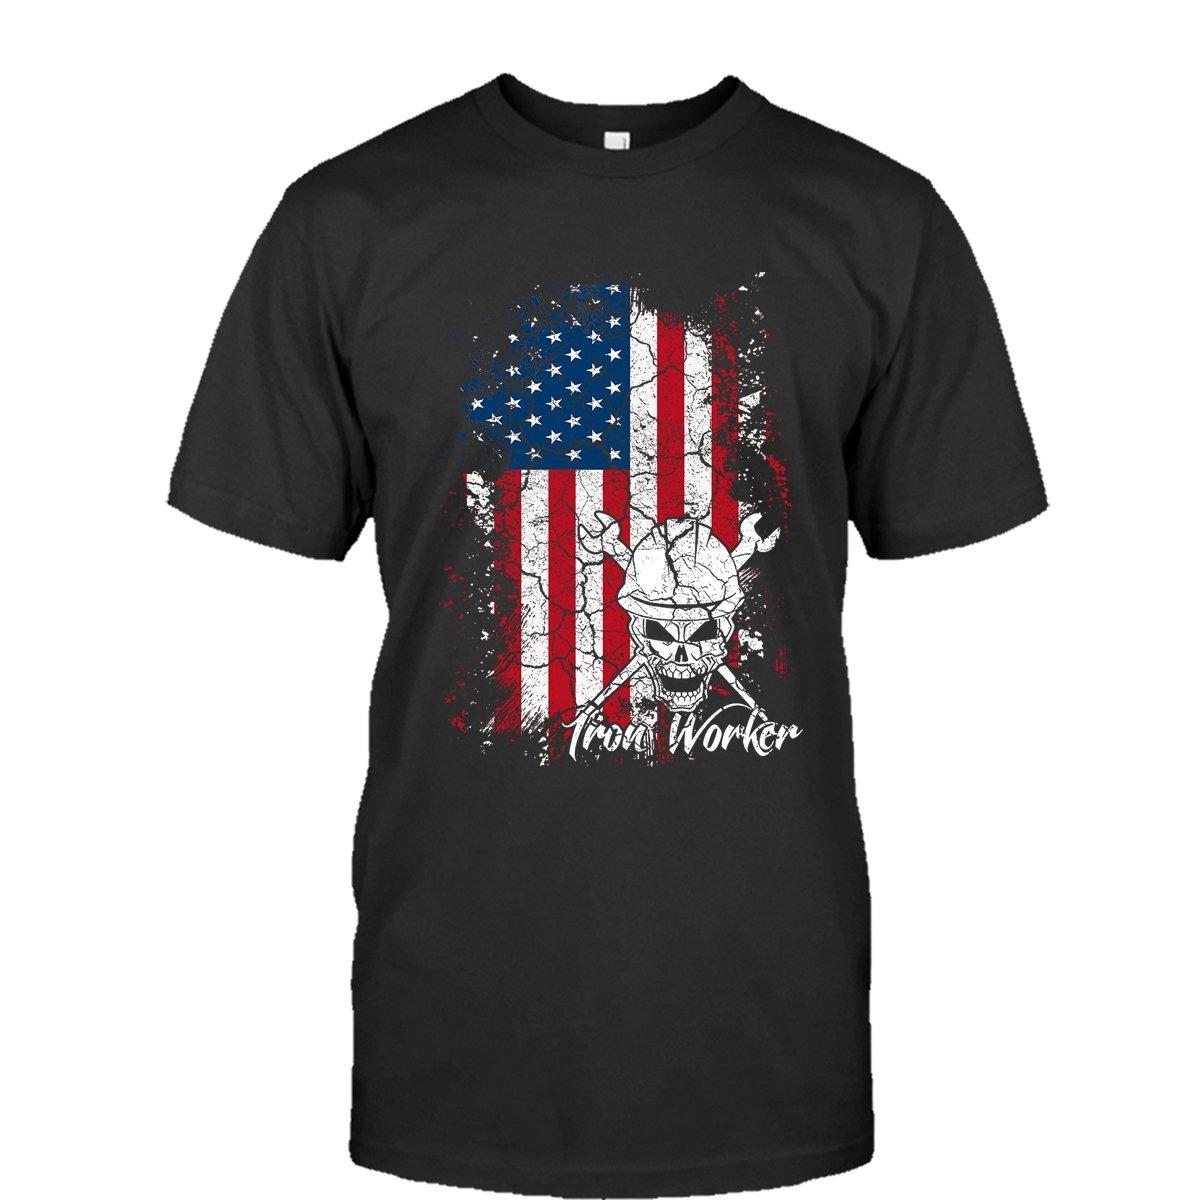 Iron Worker Flag Cool T Shirts Design Iron Worker T-Shirt